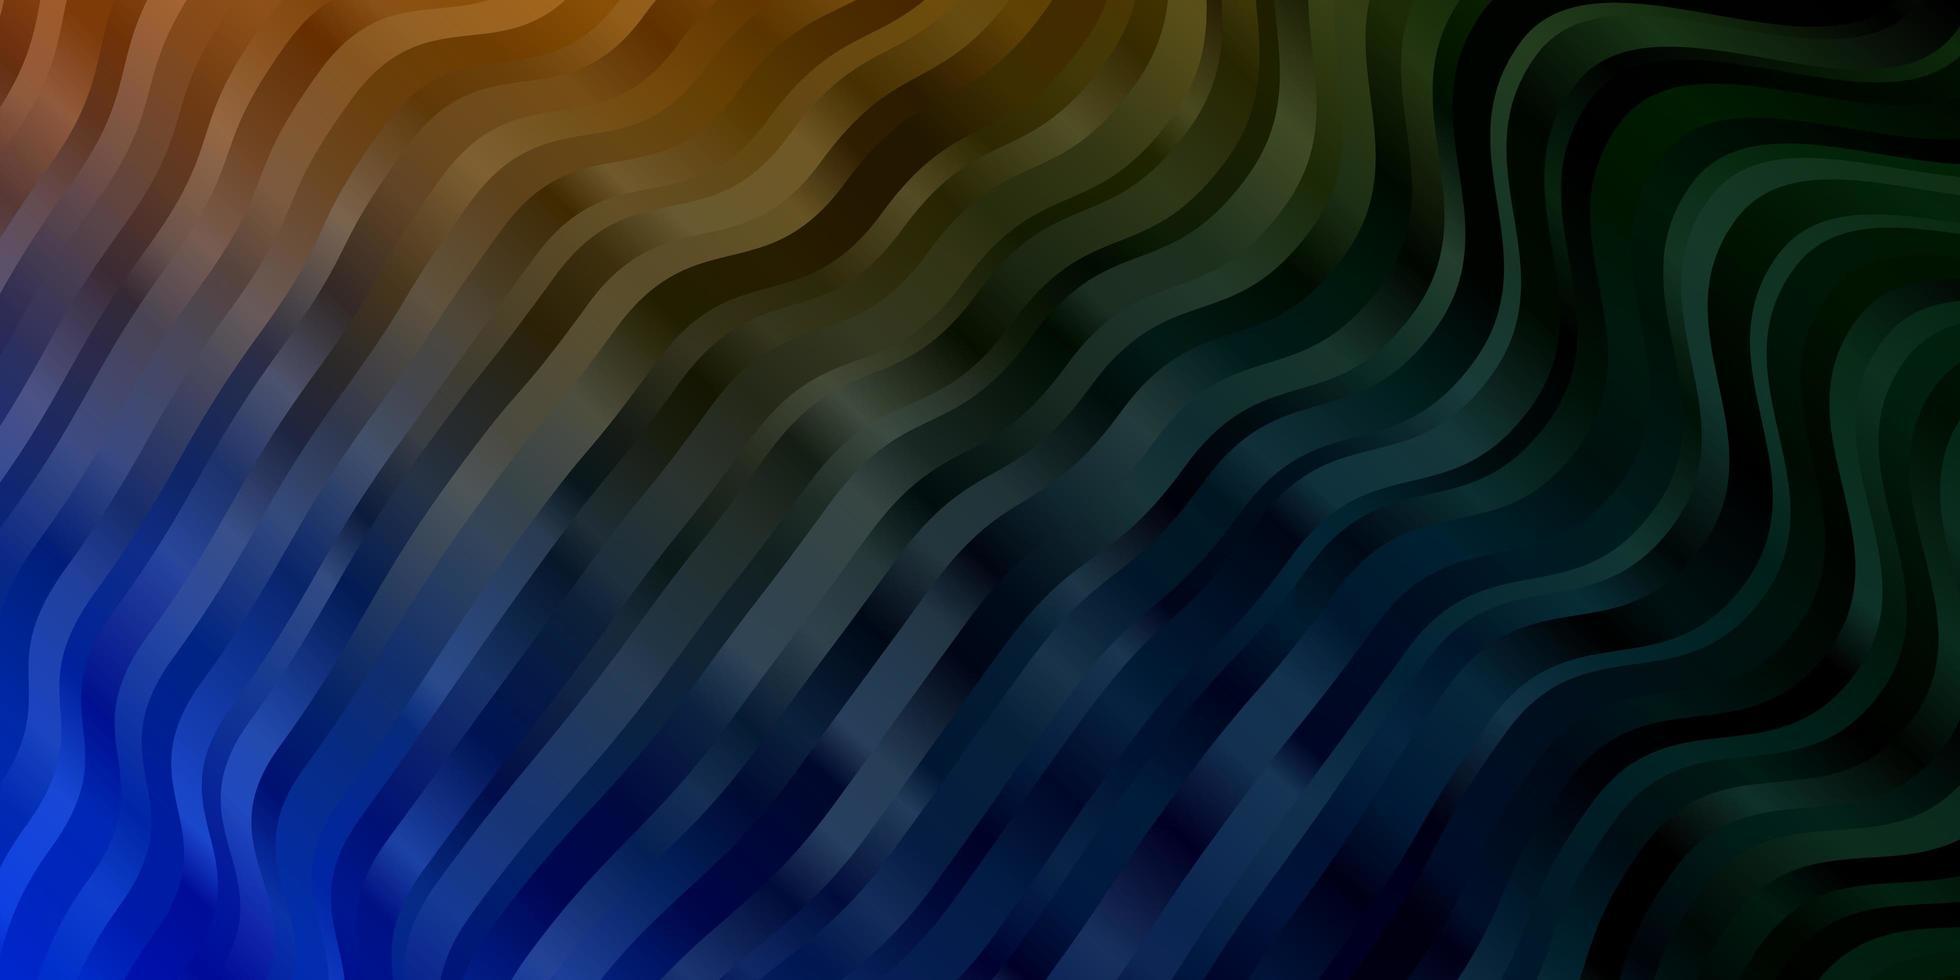 blå, gul mall med sneda linjer. vektor